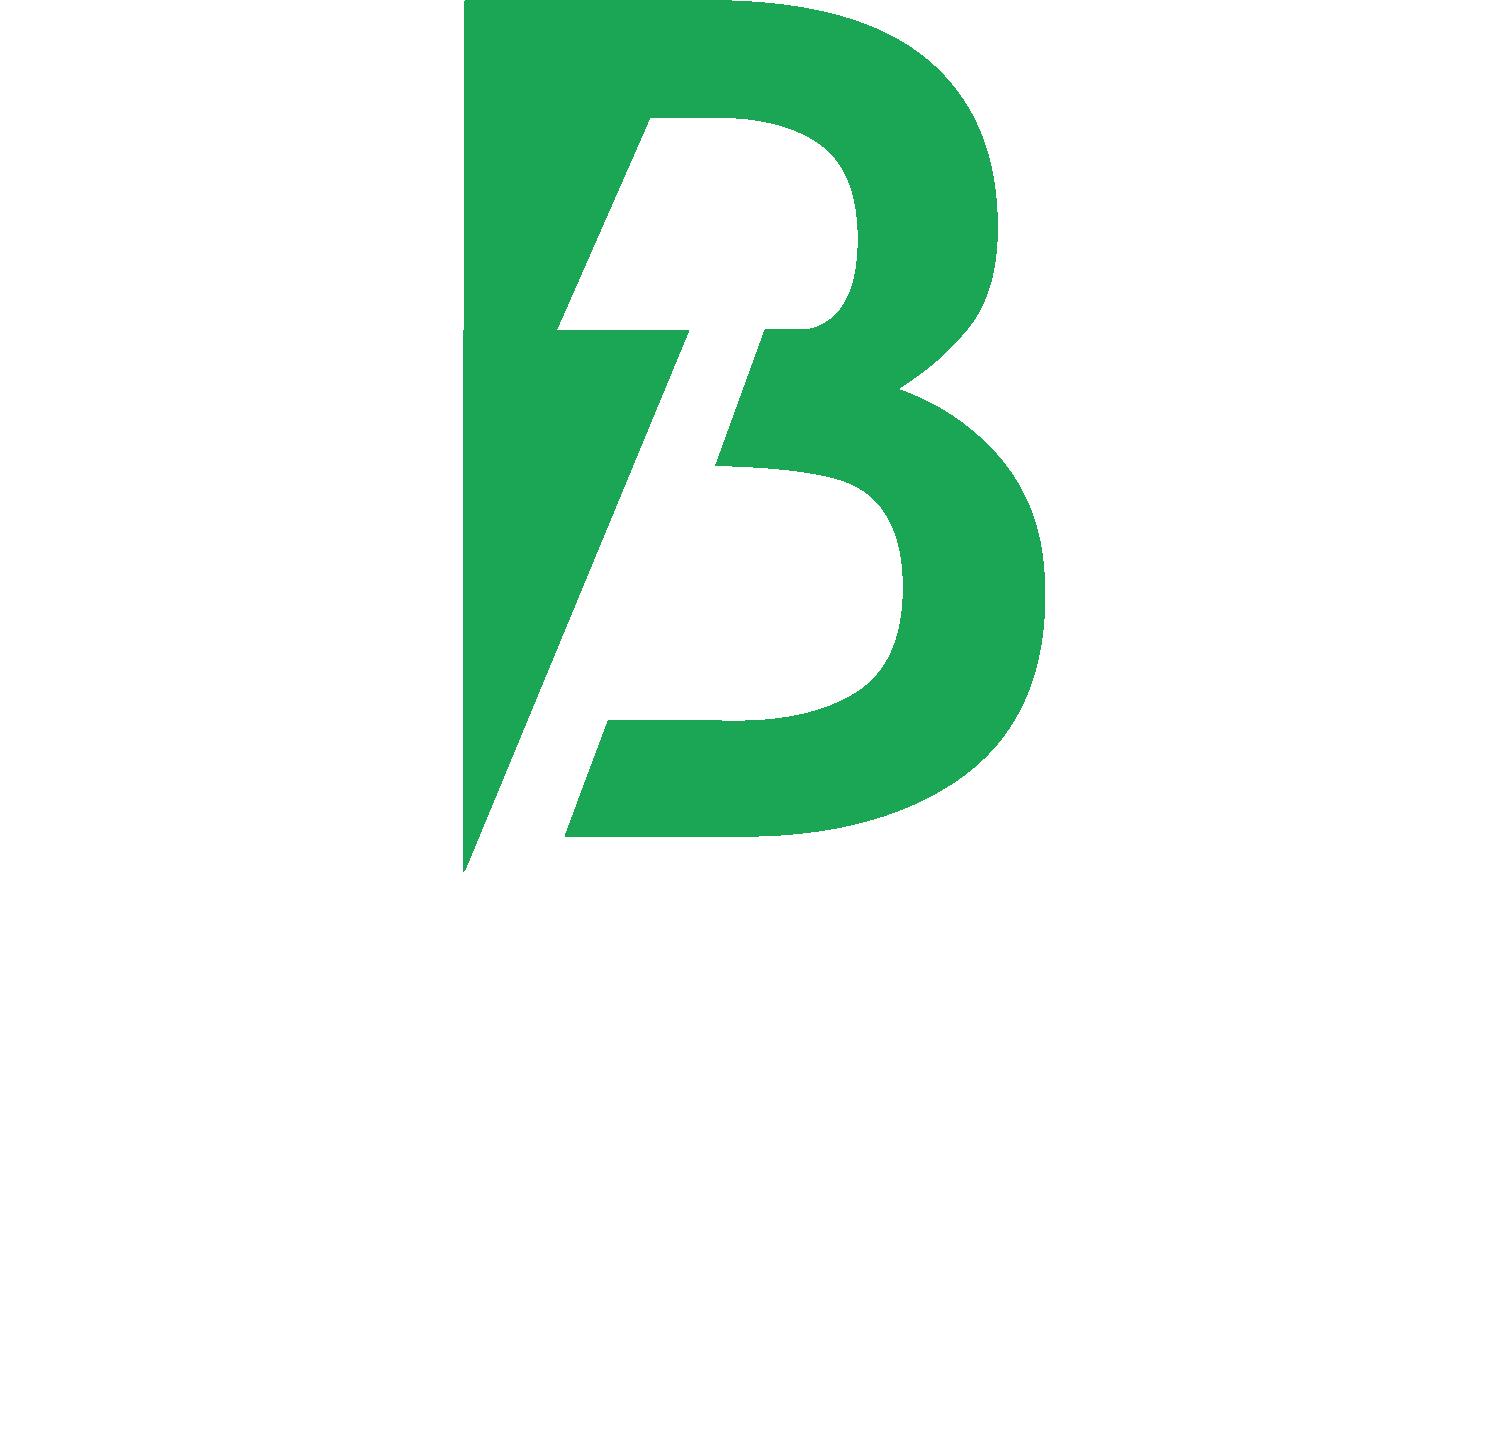 Byotta